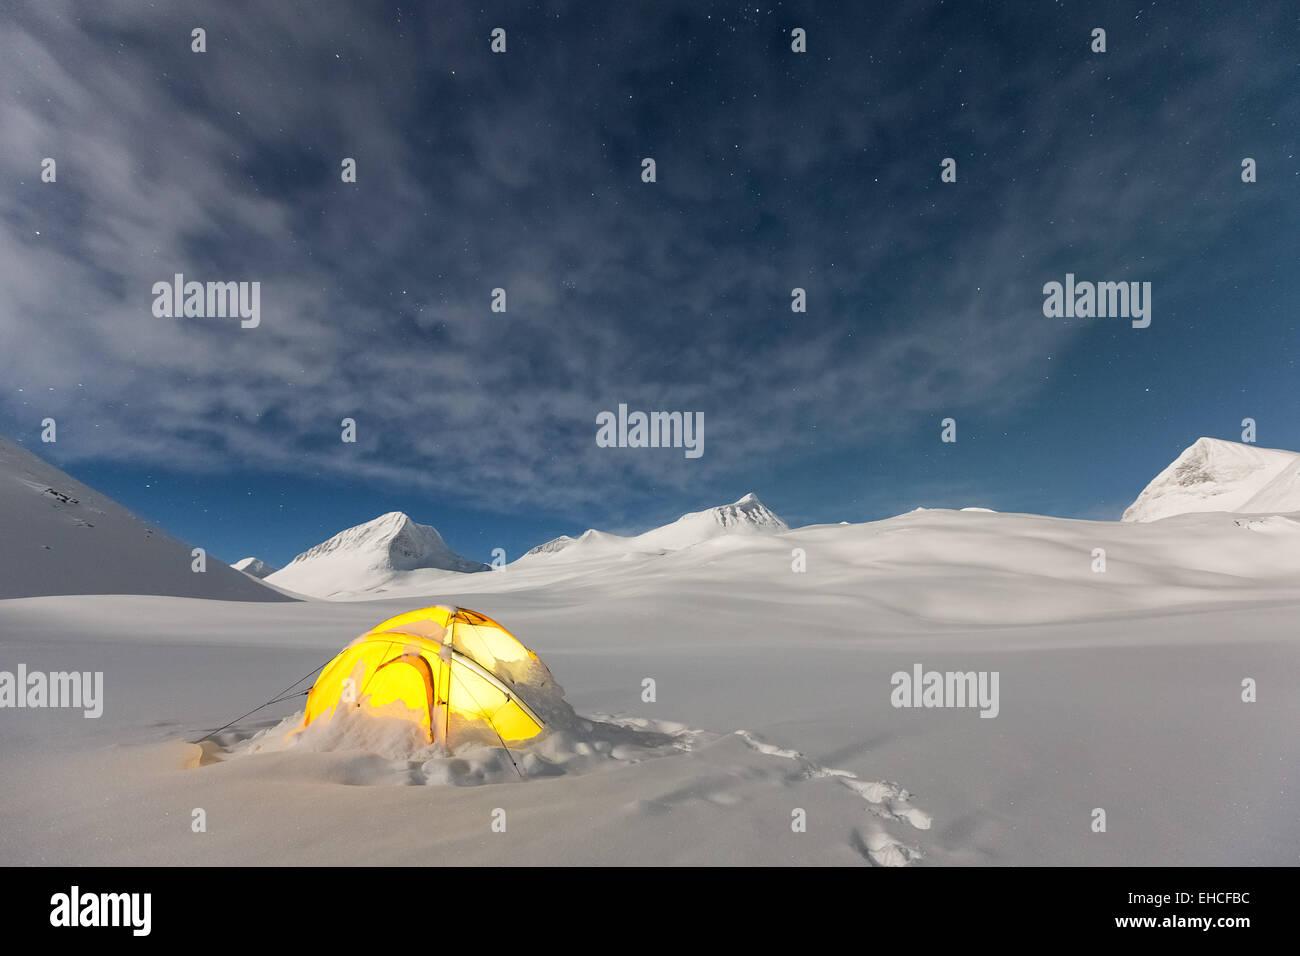 Winter camping neben Nallostugan Wildnis Hütte, Kebnekaise Berg, Kiruna, Schweden, Europa, EU Stockbild